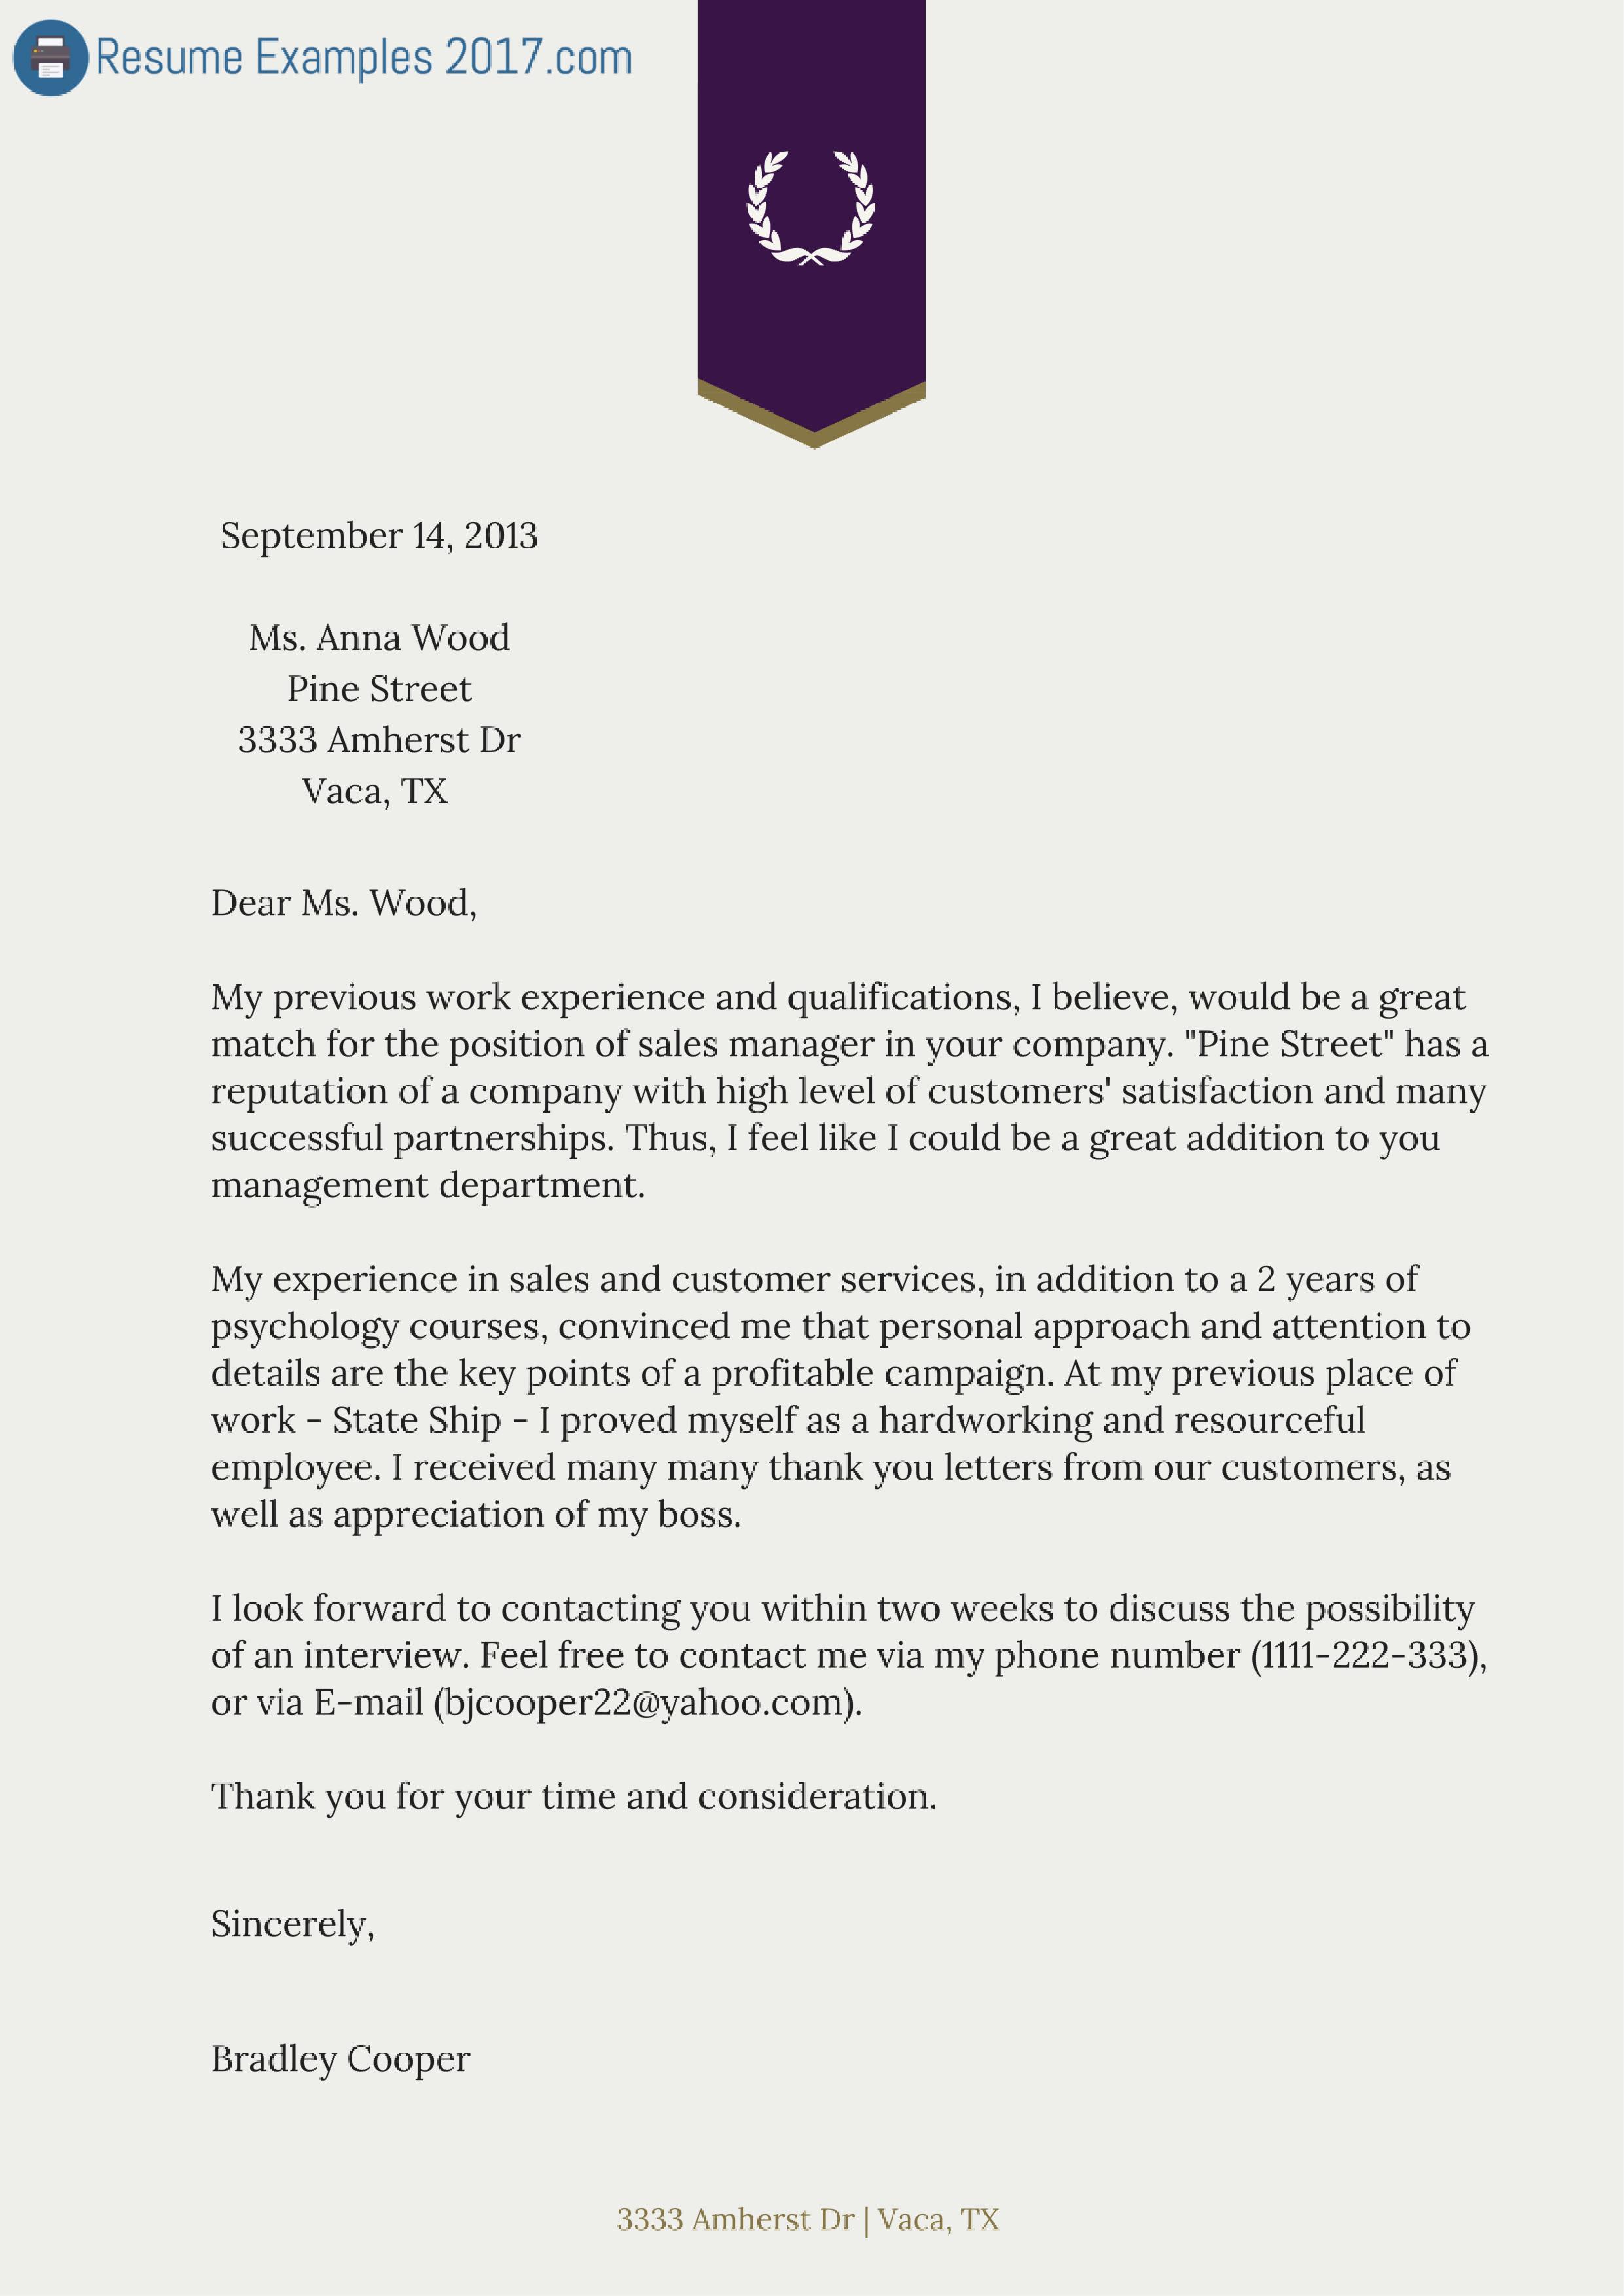 Free Resume Cover Letter Samples Lovely Download Cover Letter Samples